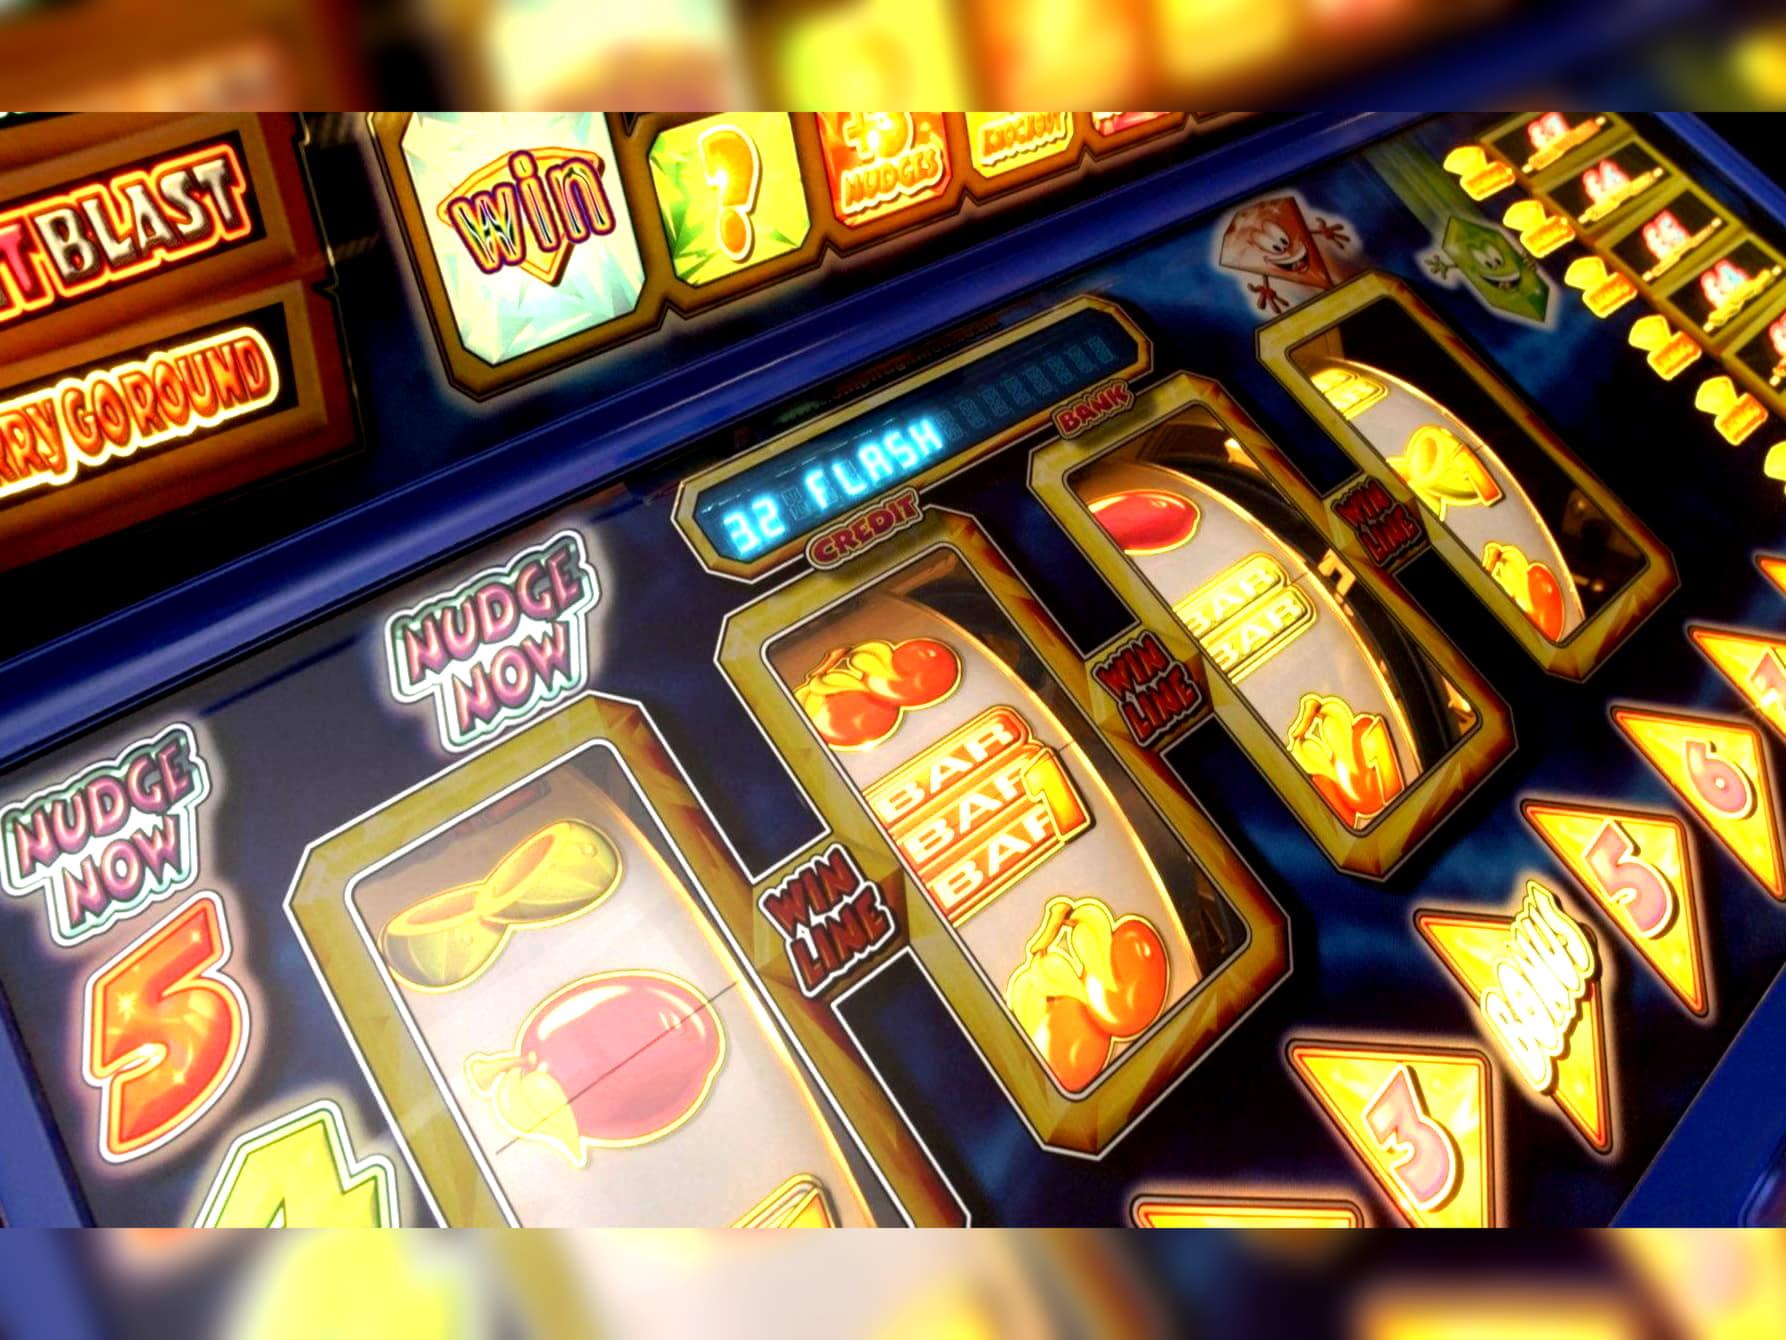 810% First Deposit Bonus at River Belle Casino